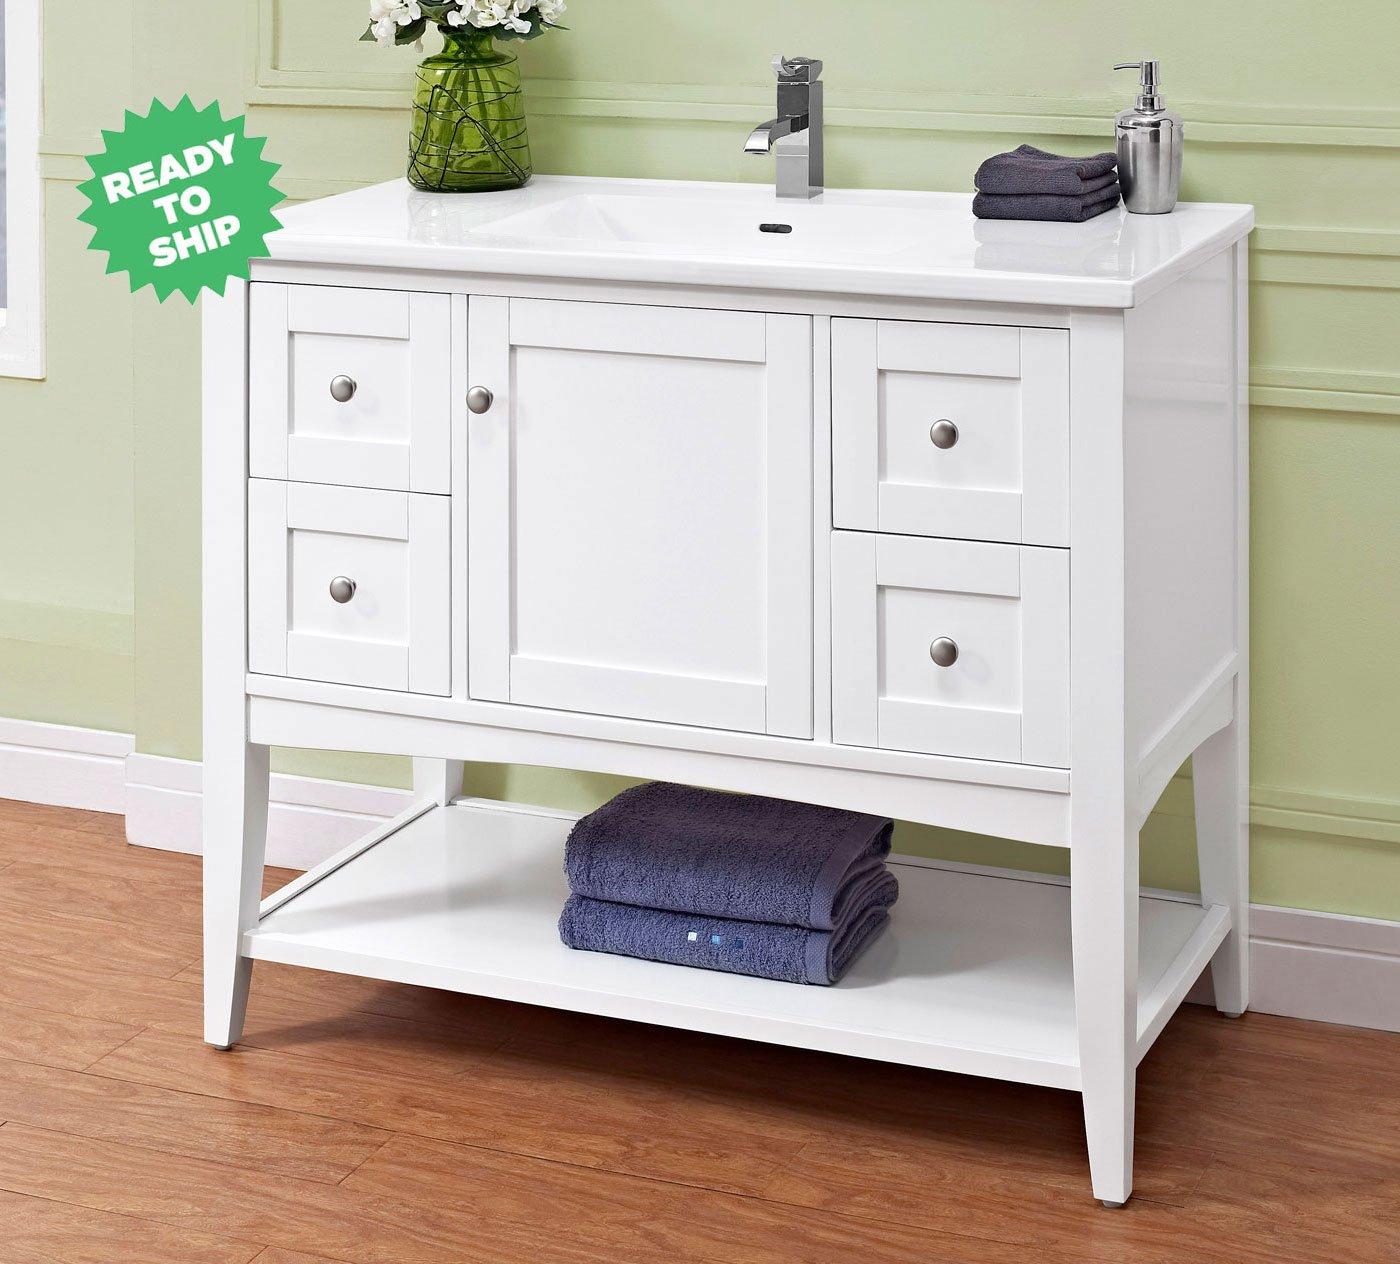 Amazon.com: Fairmont Designs 1512-VH42 Shaker Americana 42\